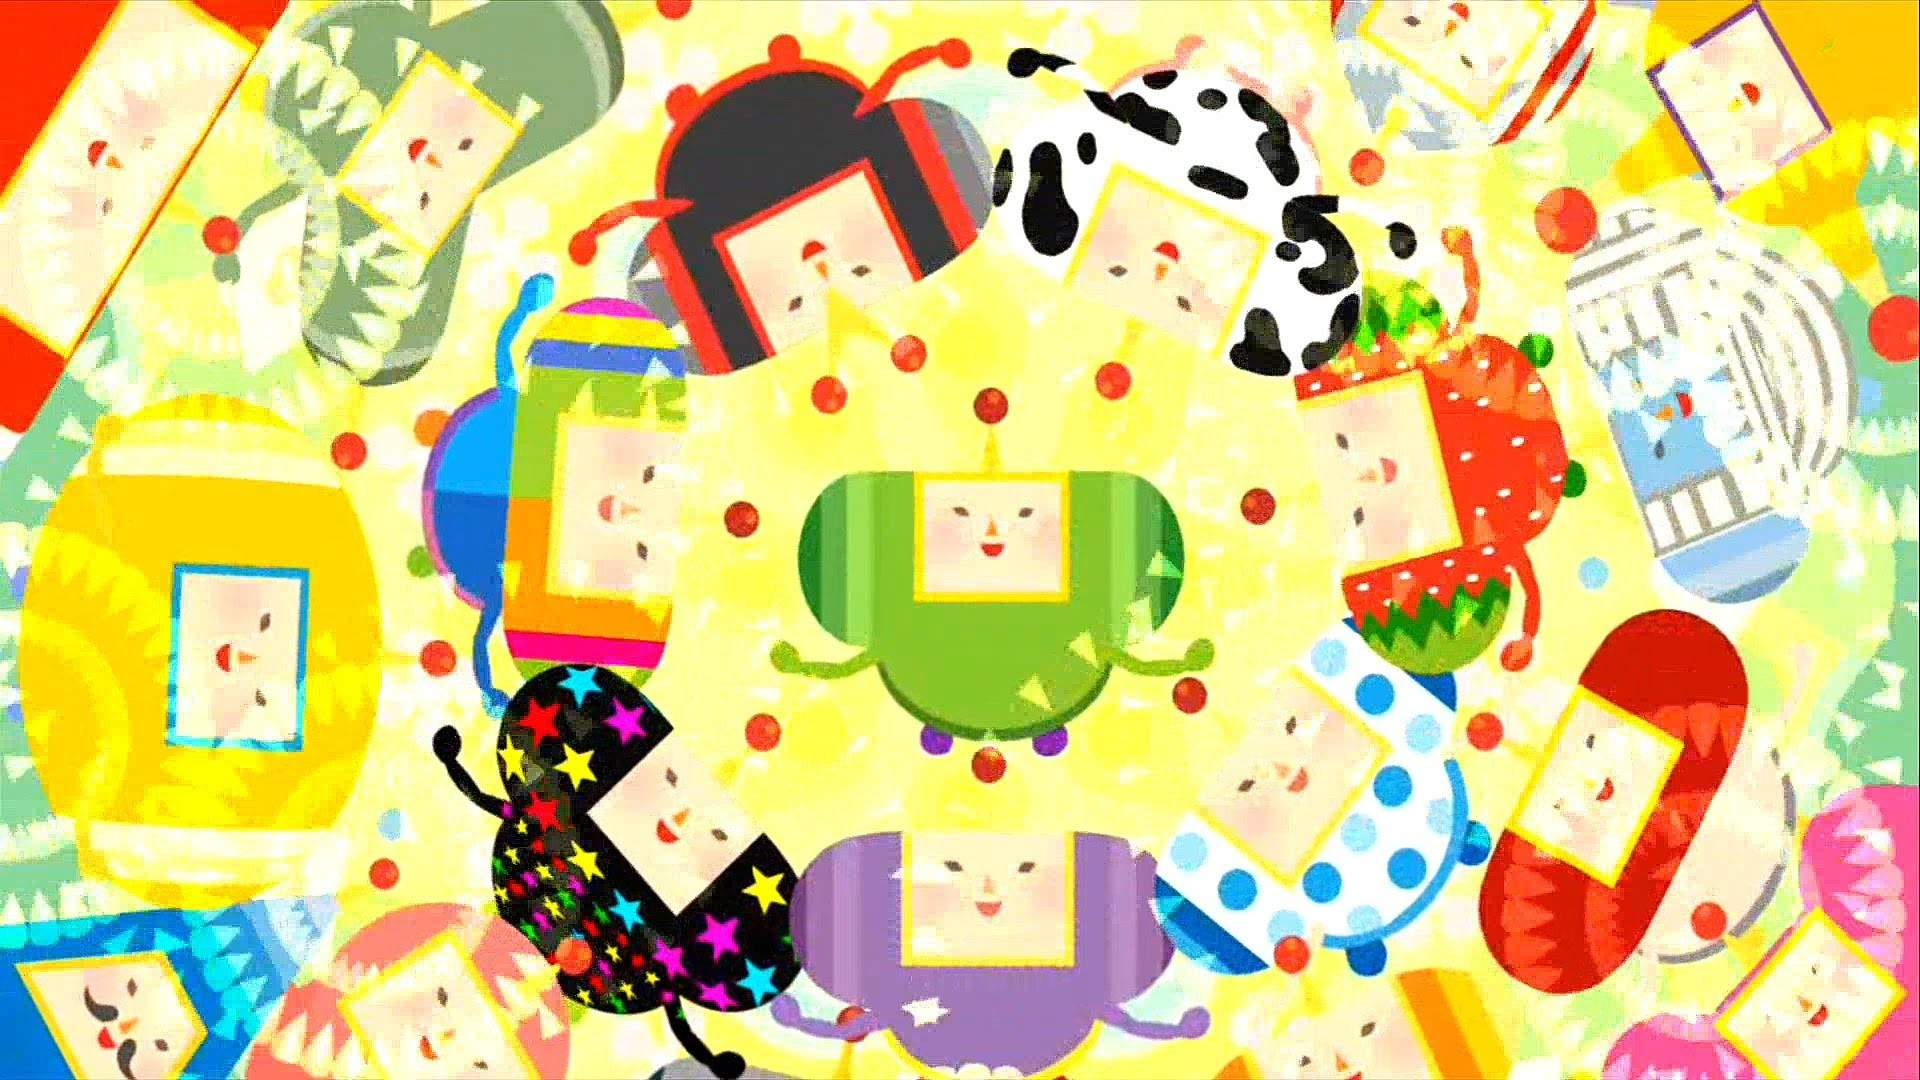 ... Game Grumps Iphone 6 Wallpaper Many HD Wallpaper